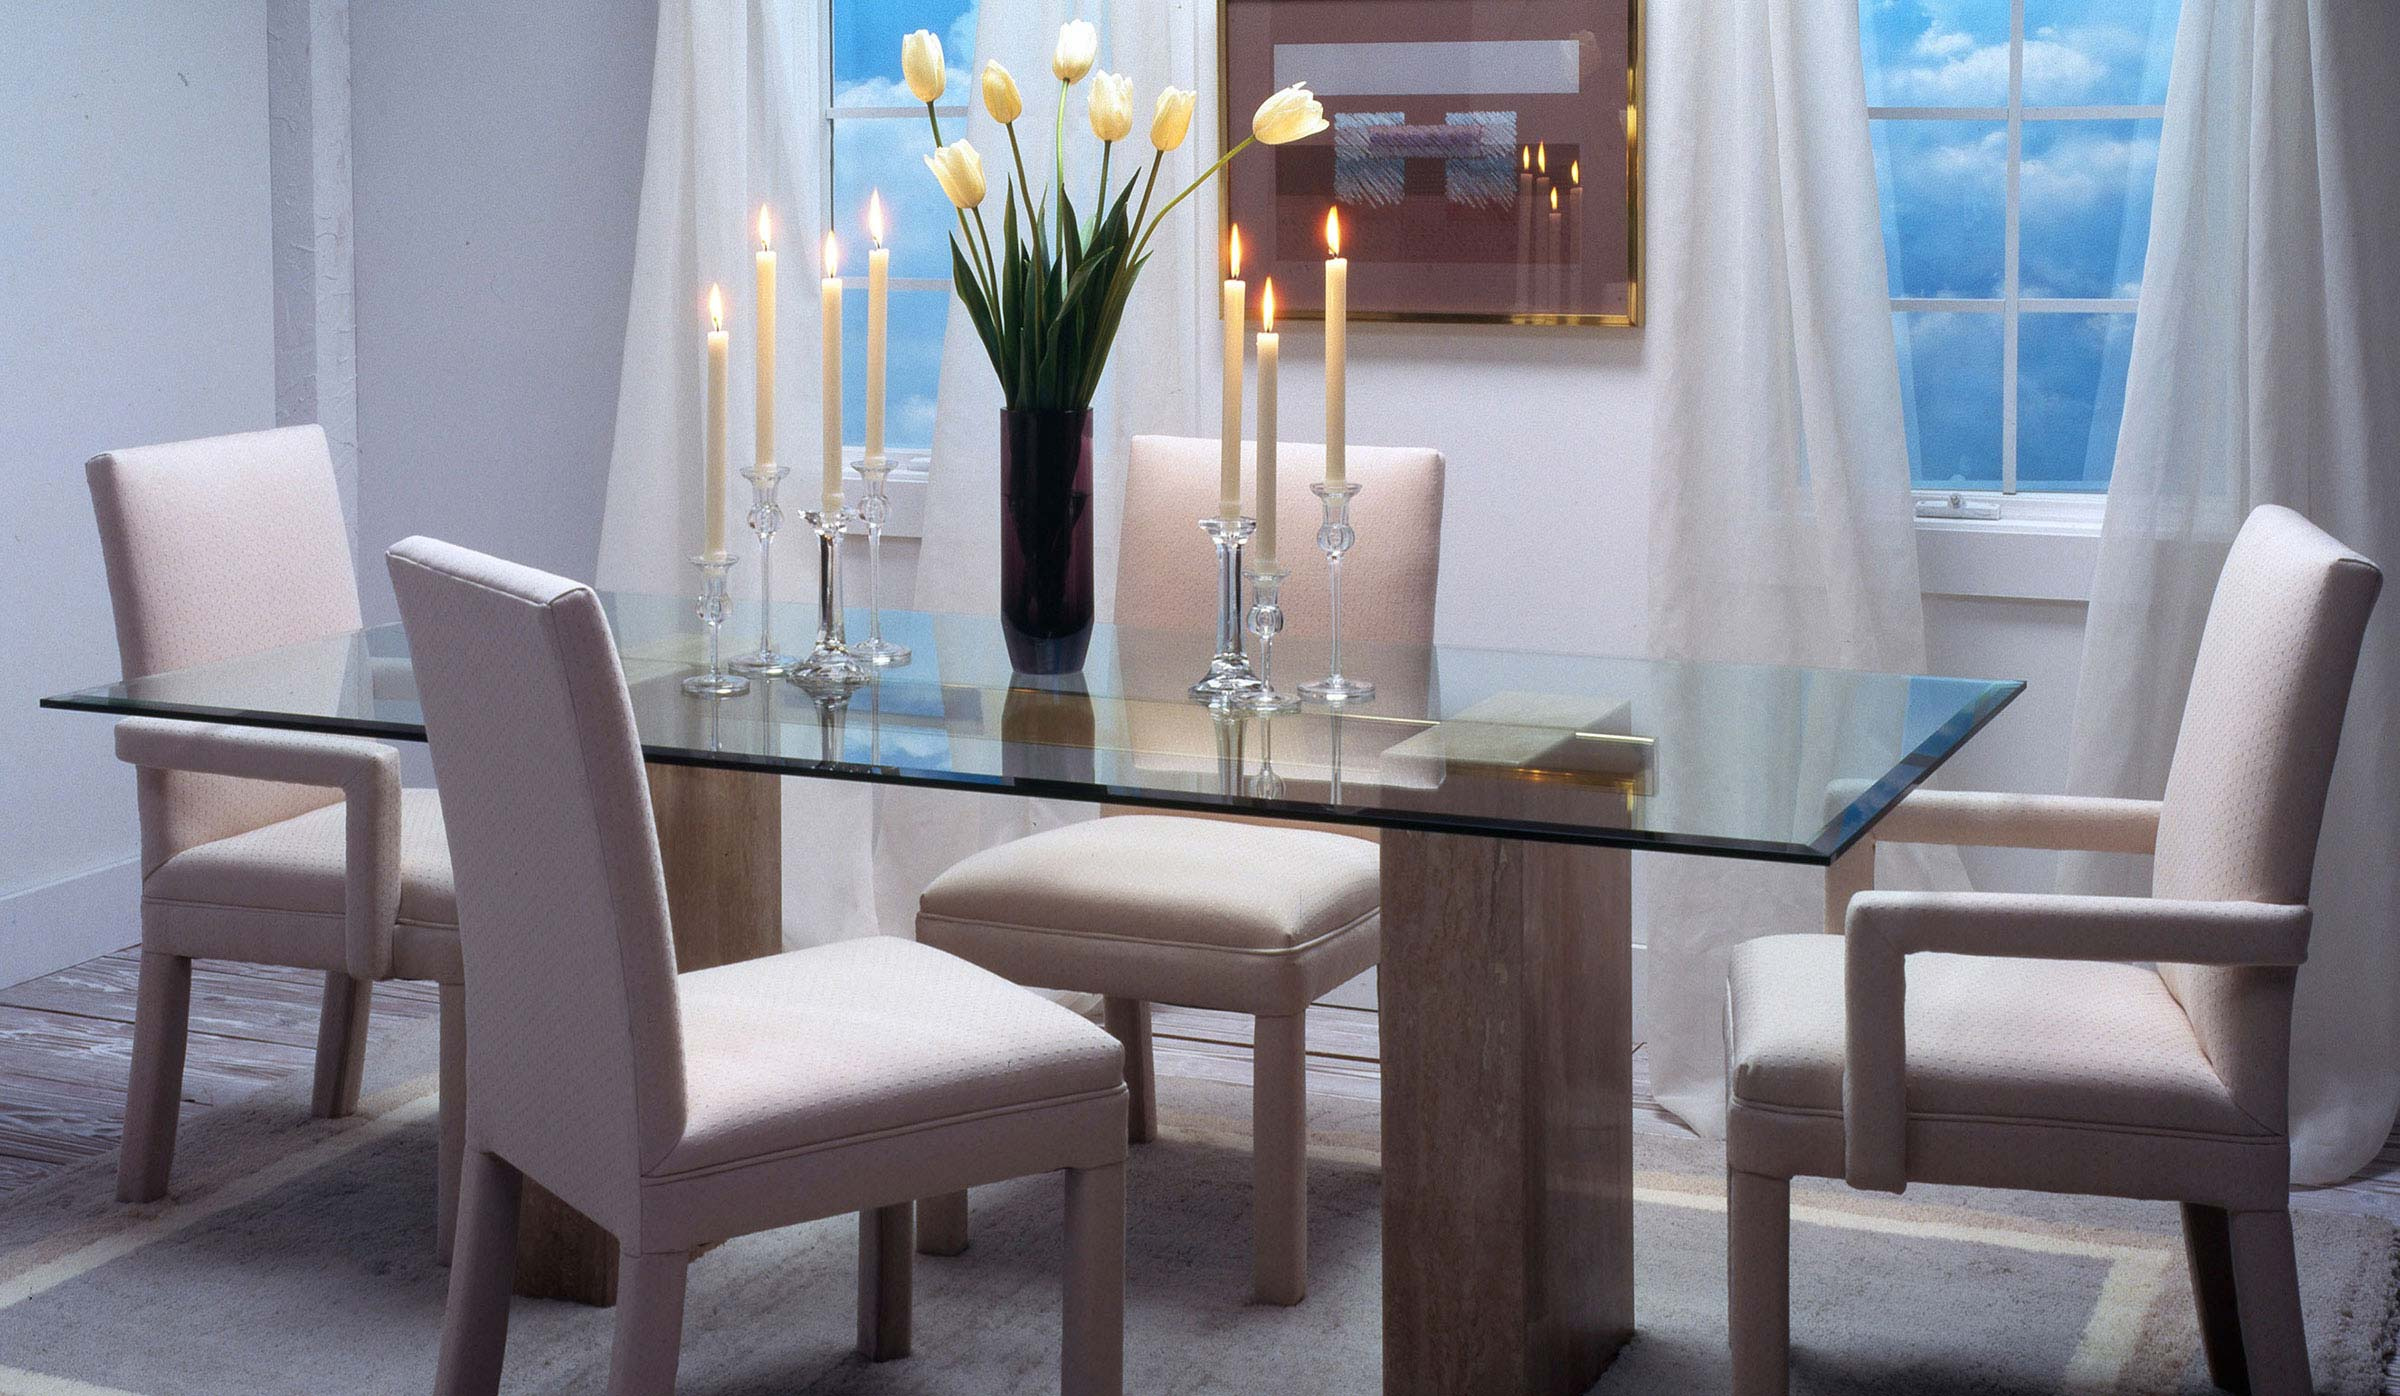 scaninavian-furniture-set18.jpg